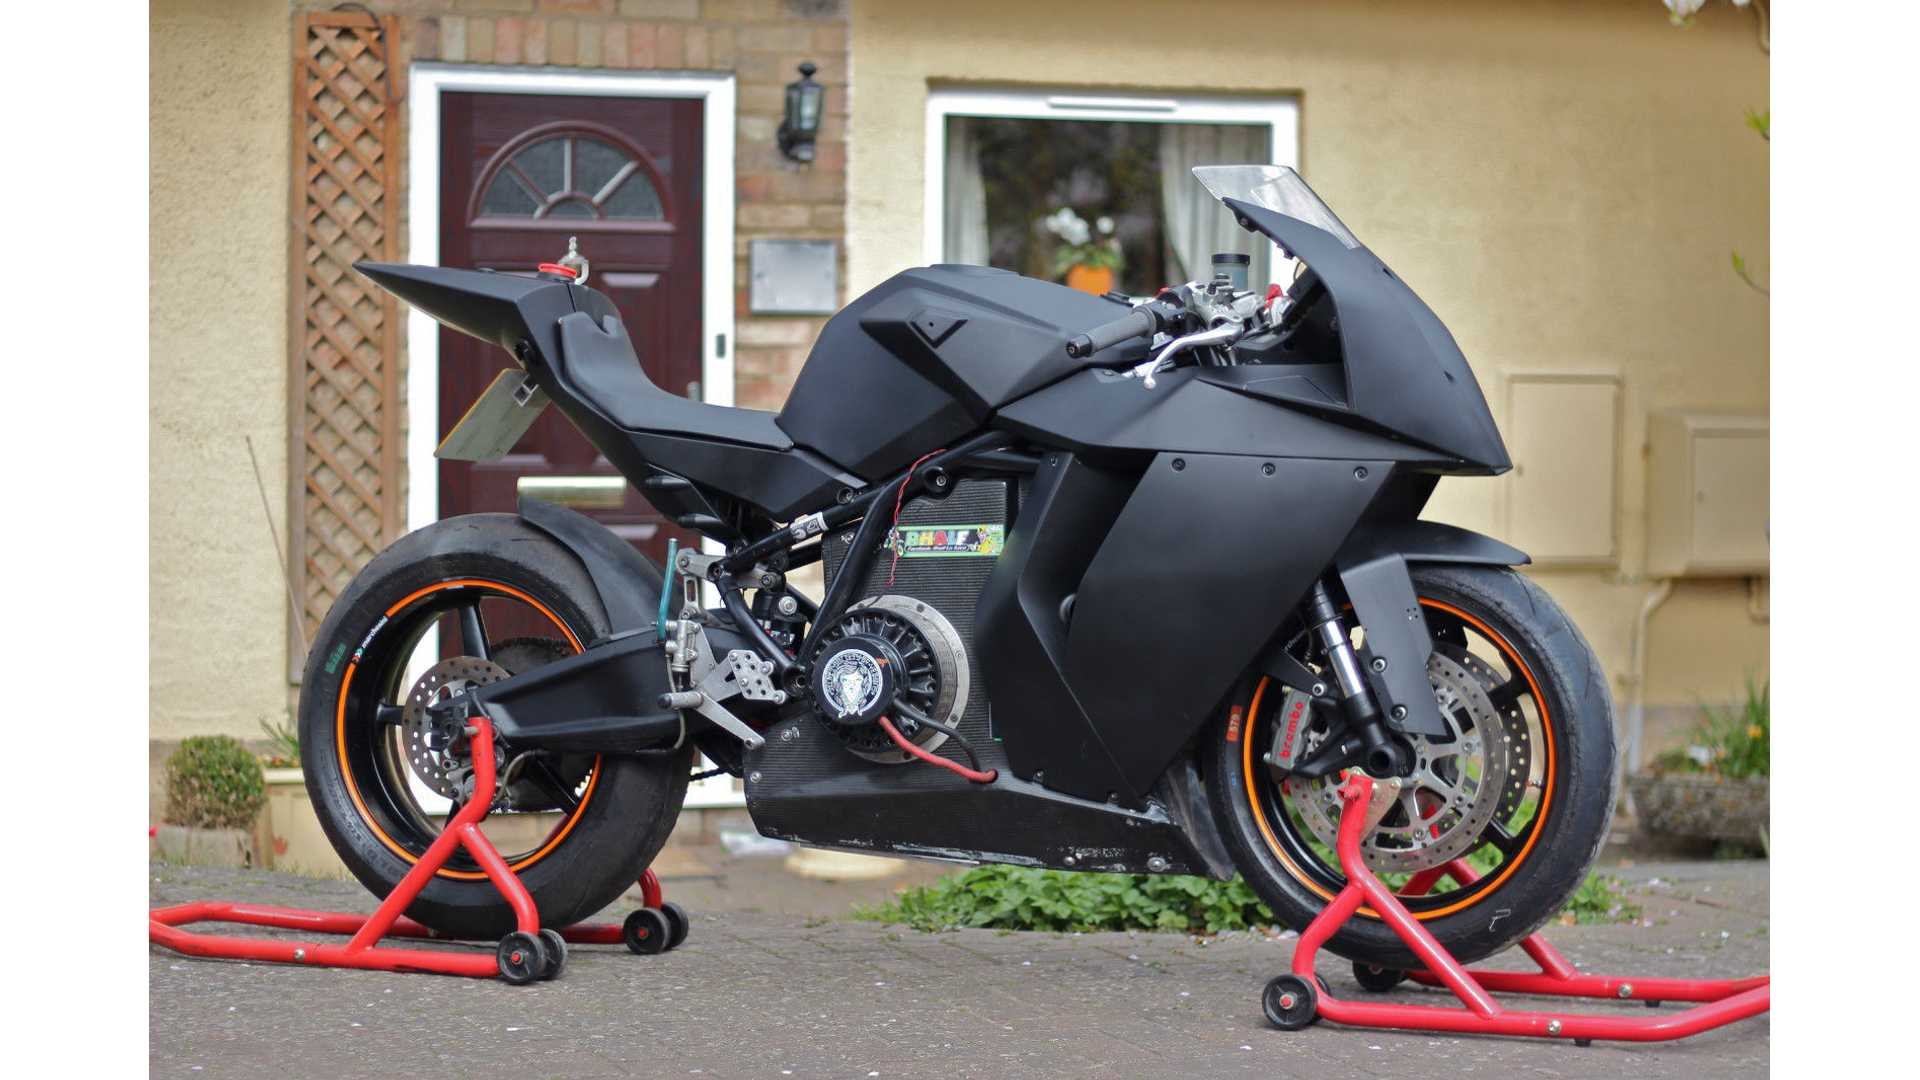 Electric Race Bike For Sale Mavizen Ttx02 On Ebay